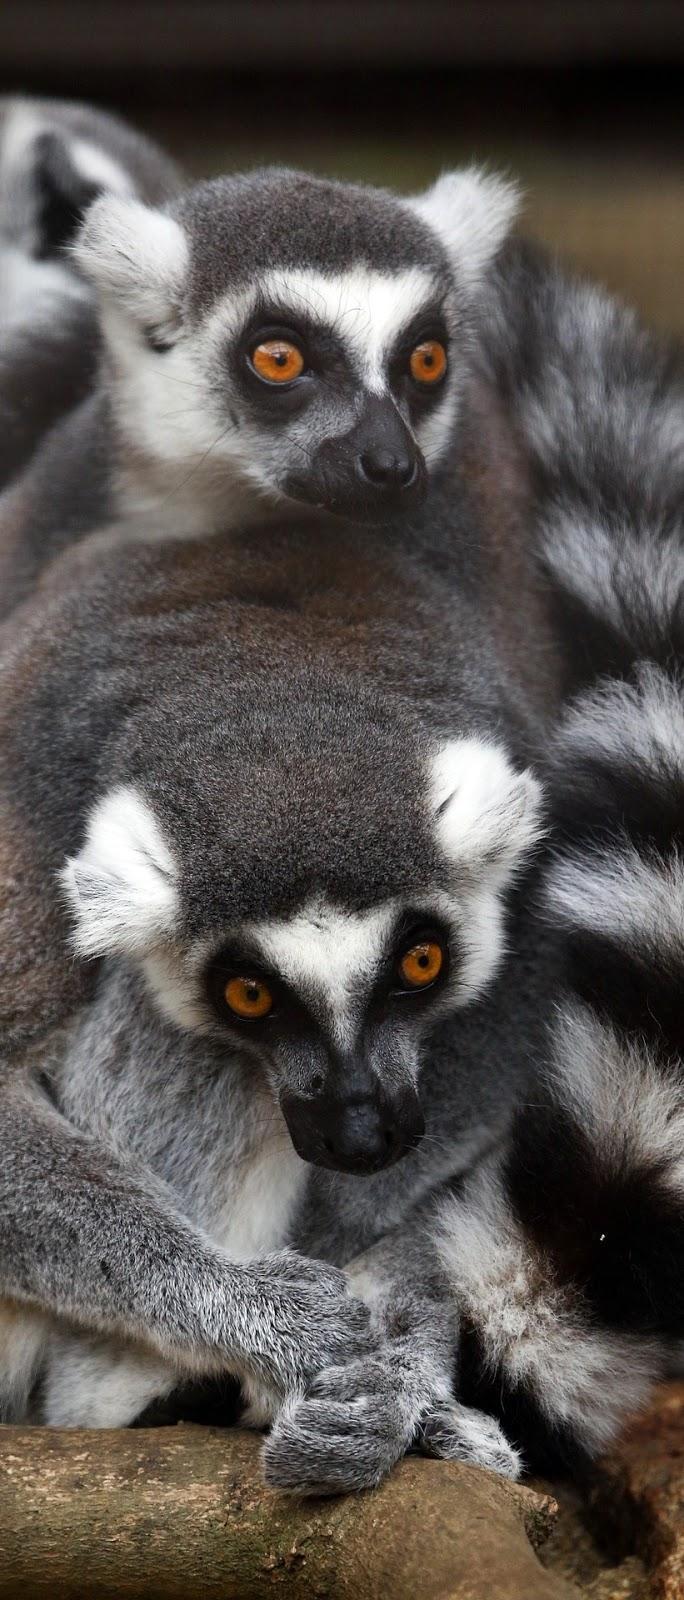 Cute lemurs cuddling.